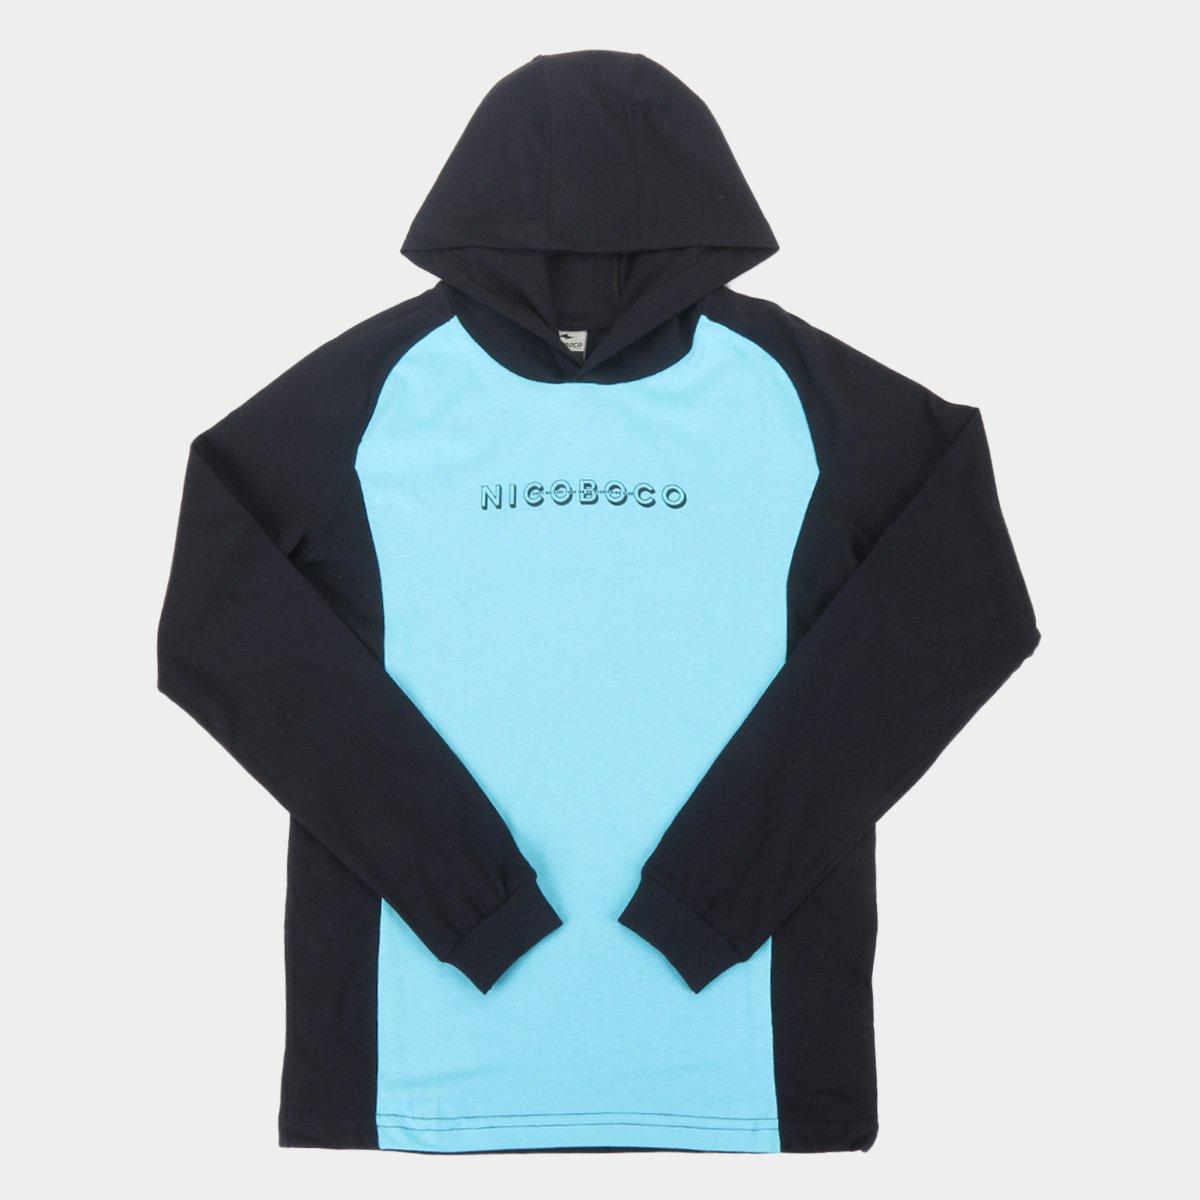 Camiseta Juvenil Nicoboco Manga Longa Water Capuz Masculina